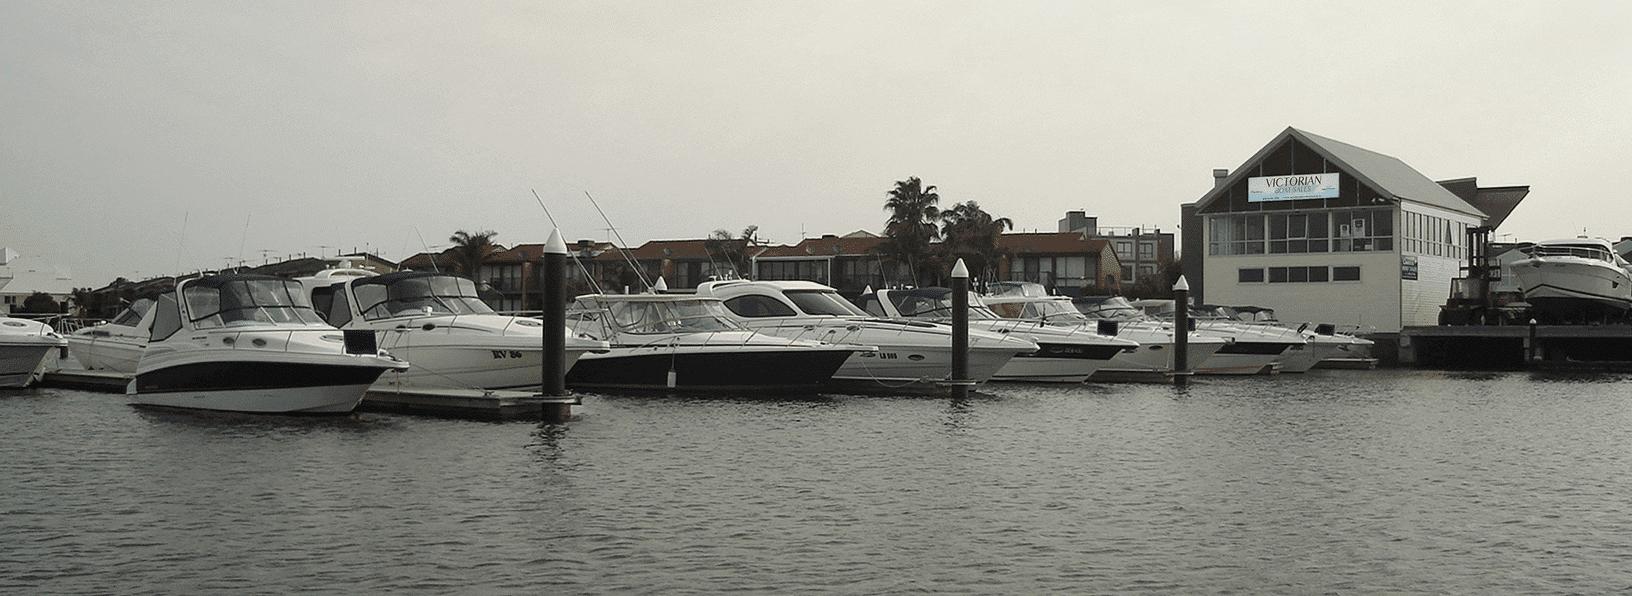 VictorianBoatSalesOffice-1 Victorian Boat Sales